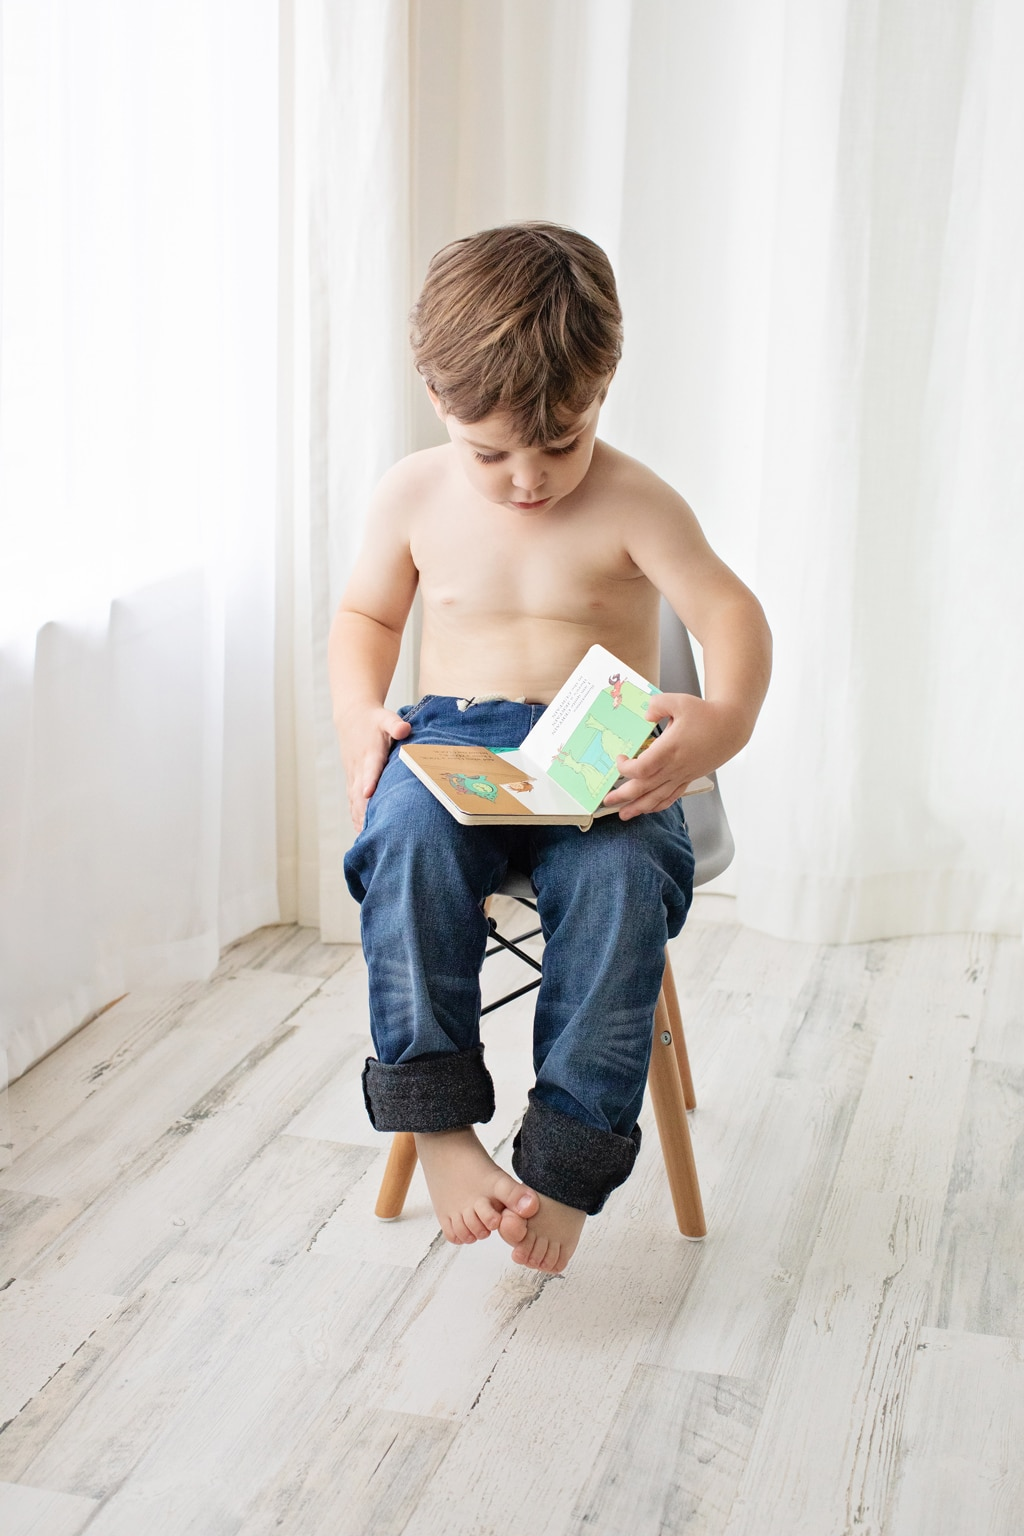 cute boy reads in private studio session